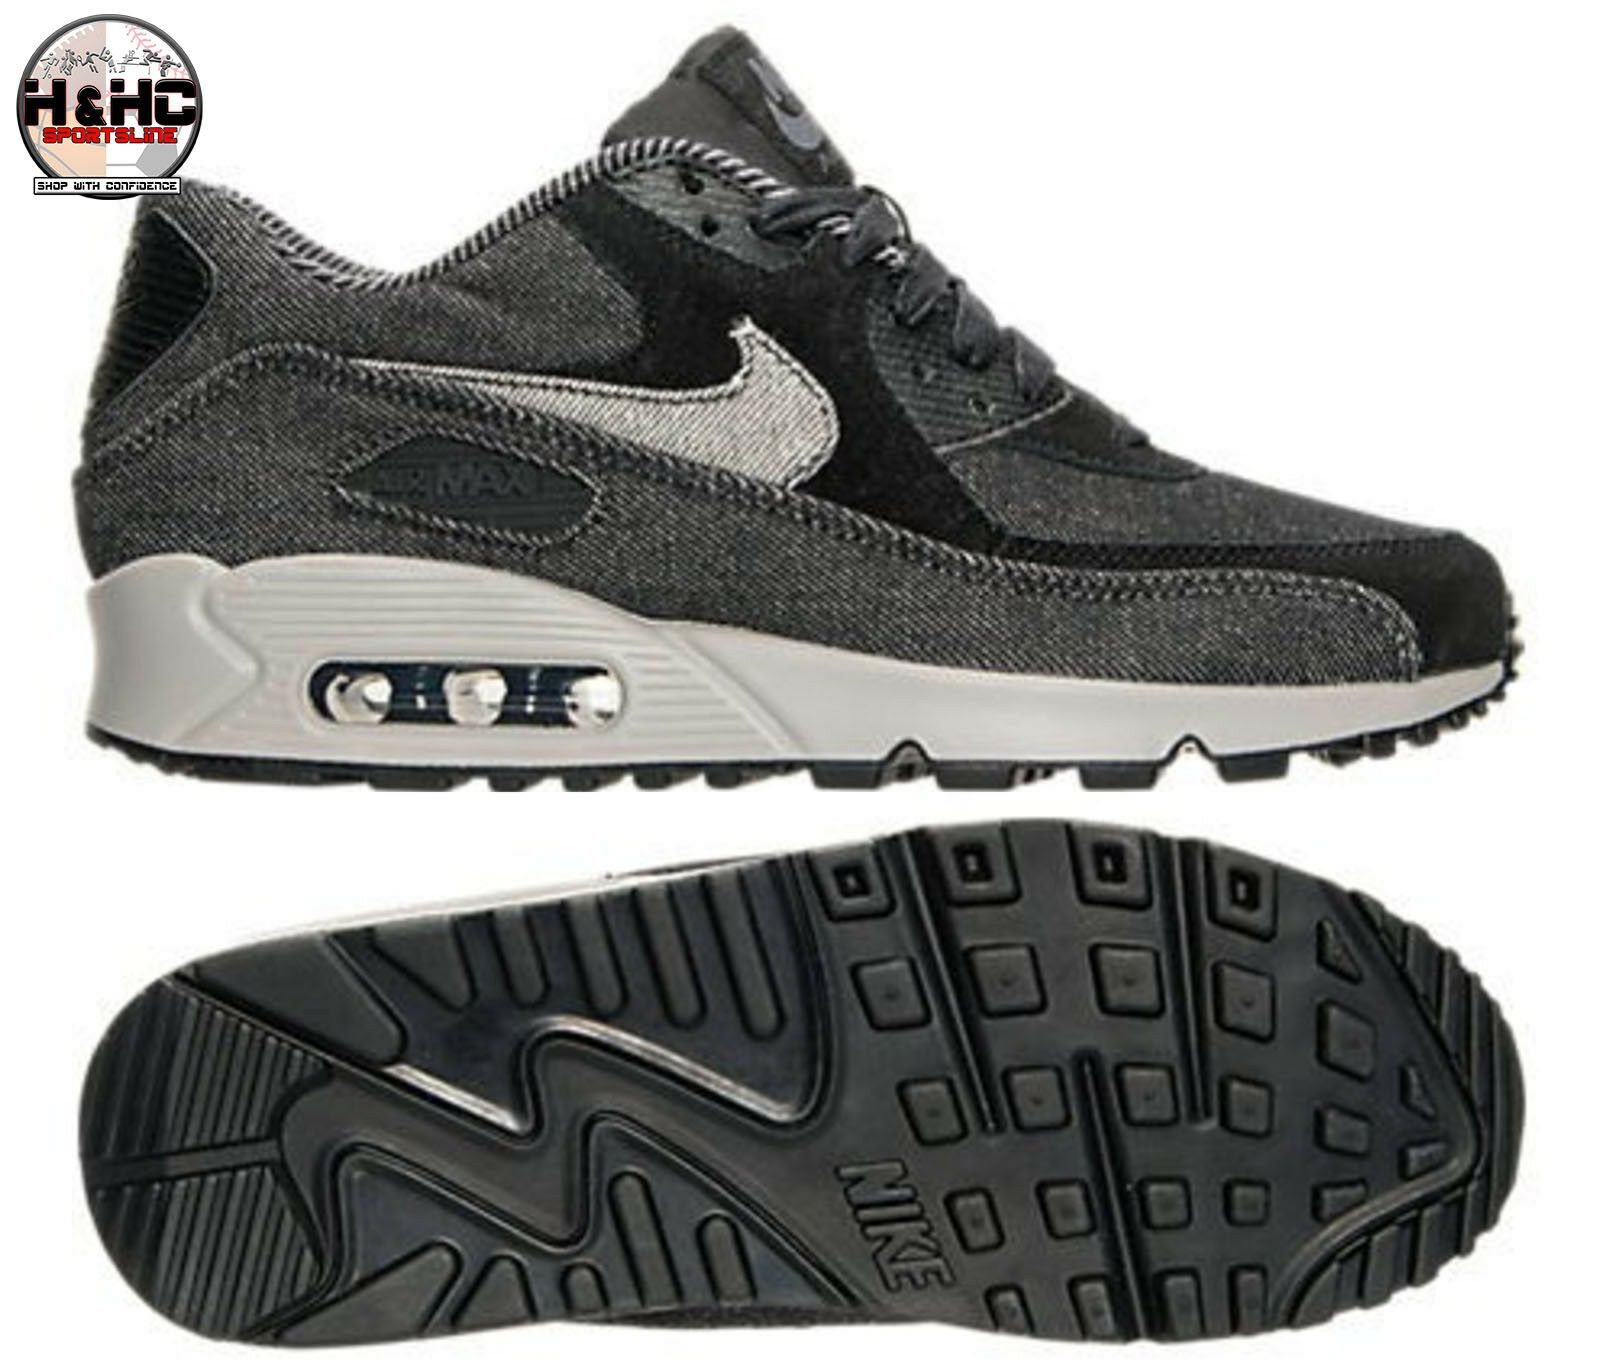 Nike Air Max 90 SE 881105 002 Black/Black-Dark Grey Women's Shoes Sz 5